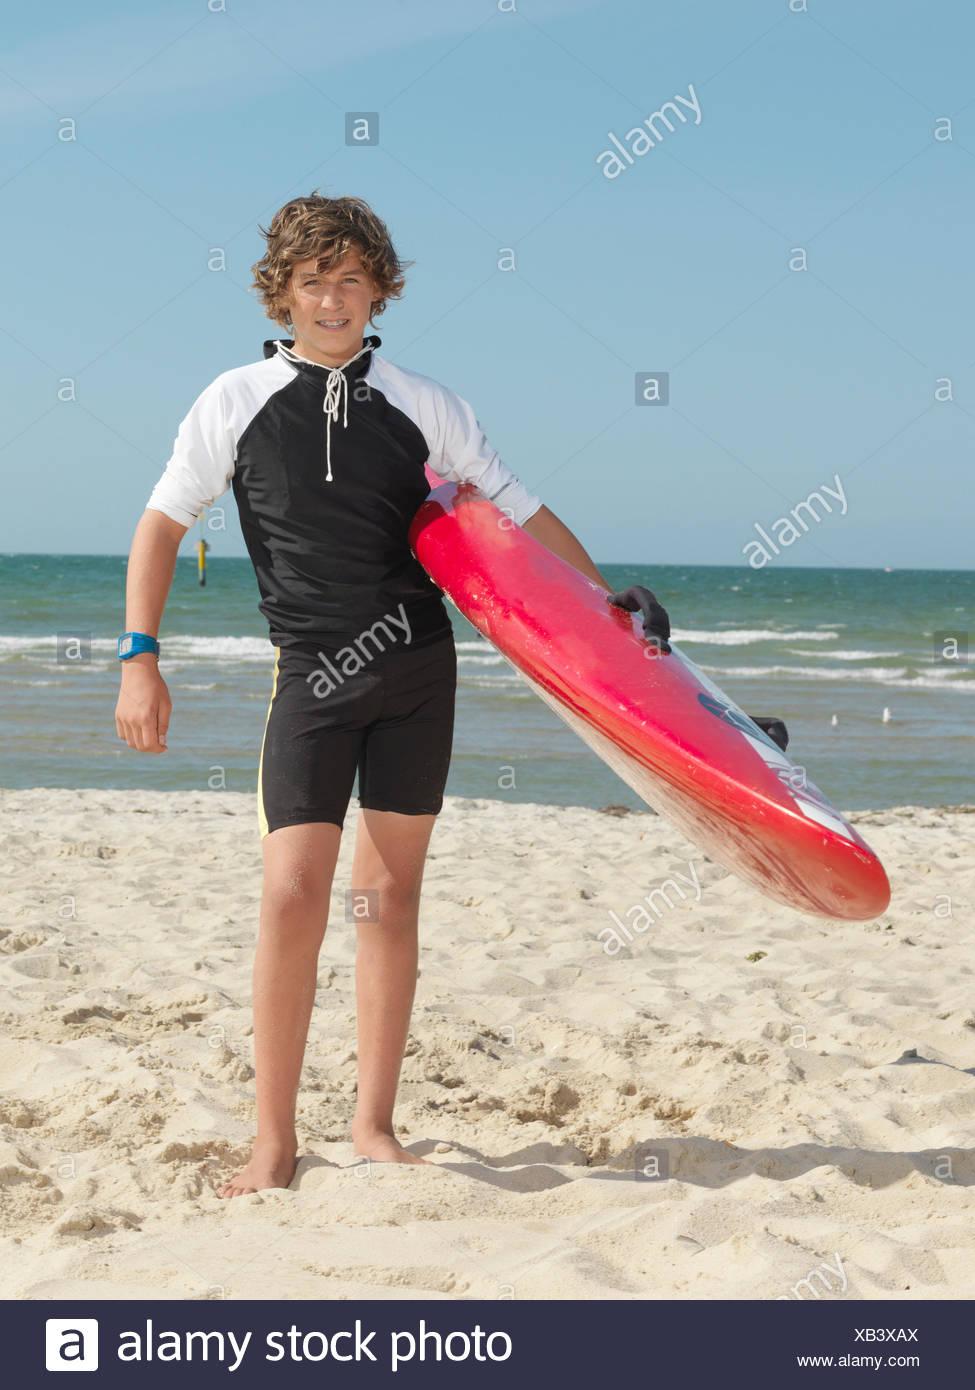 Portrait of teenage boy nipper (child surf life savers) carrying surfboard, Altona, Melbourne, Australia - Stock Image